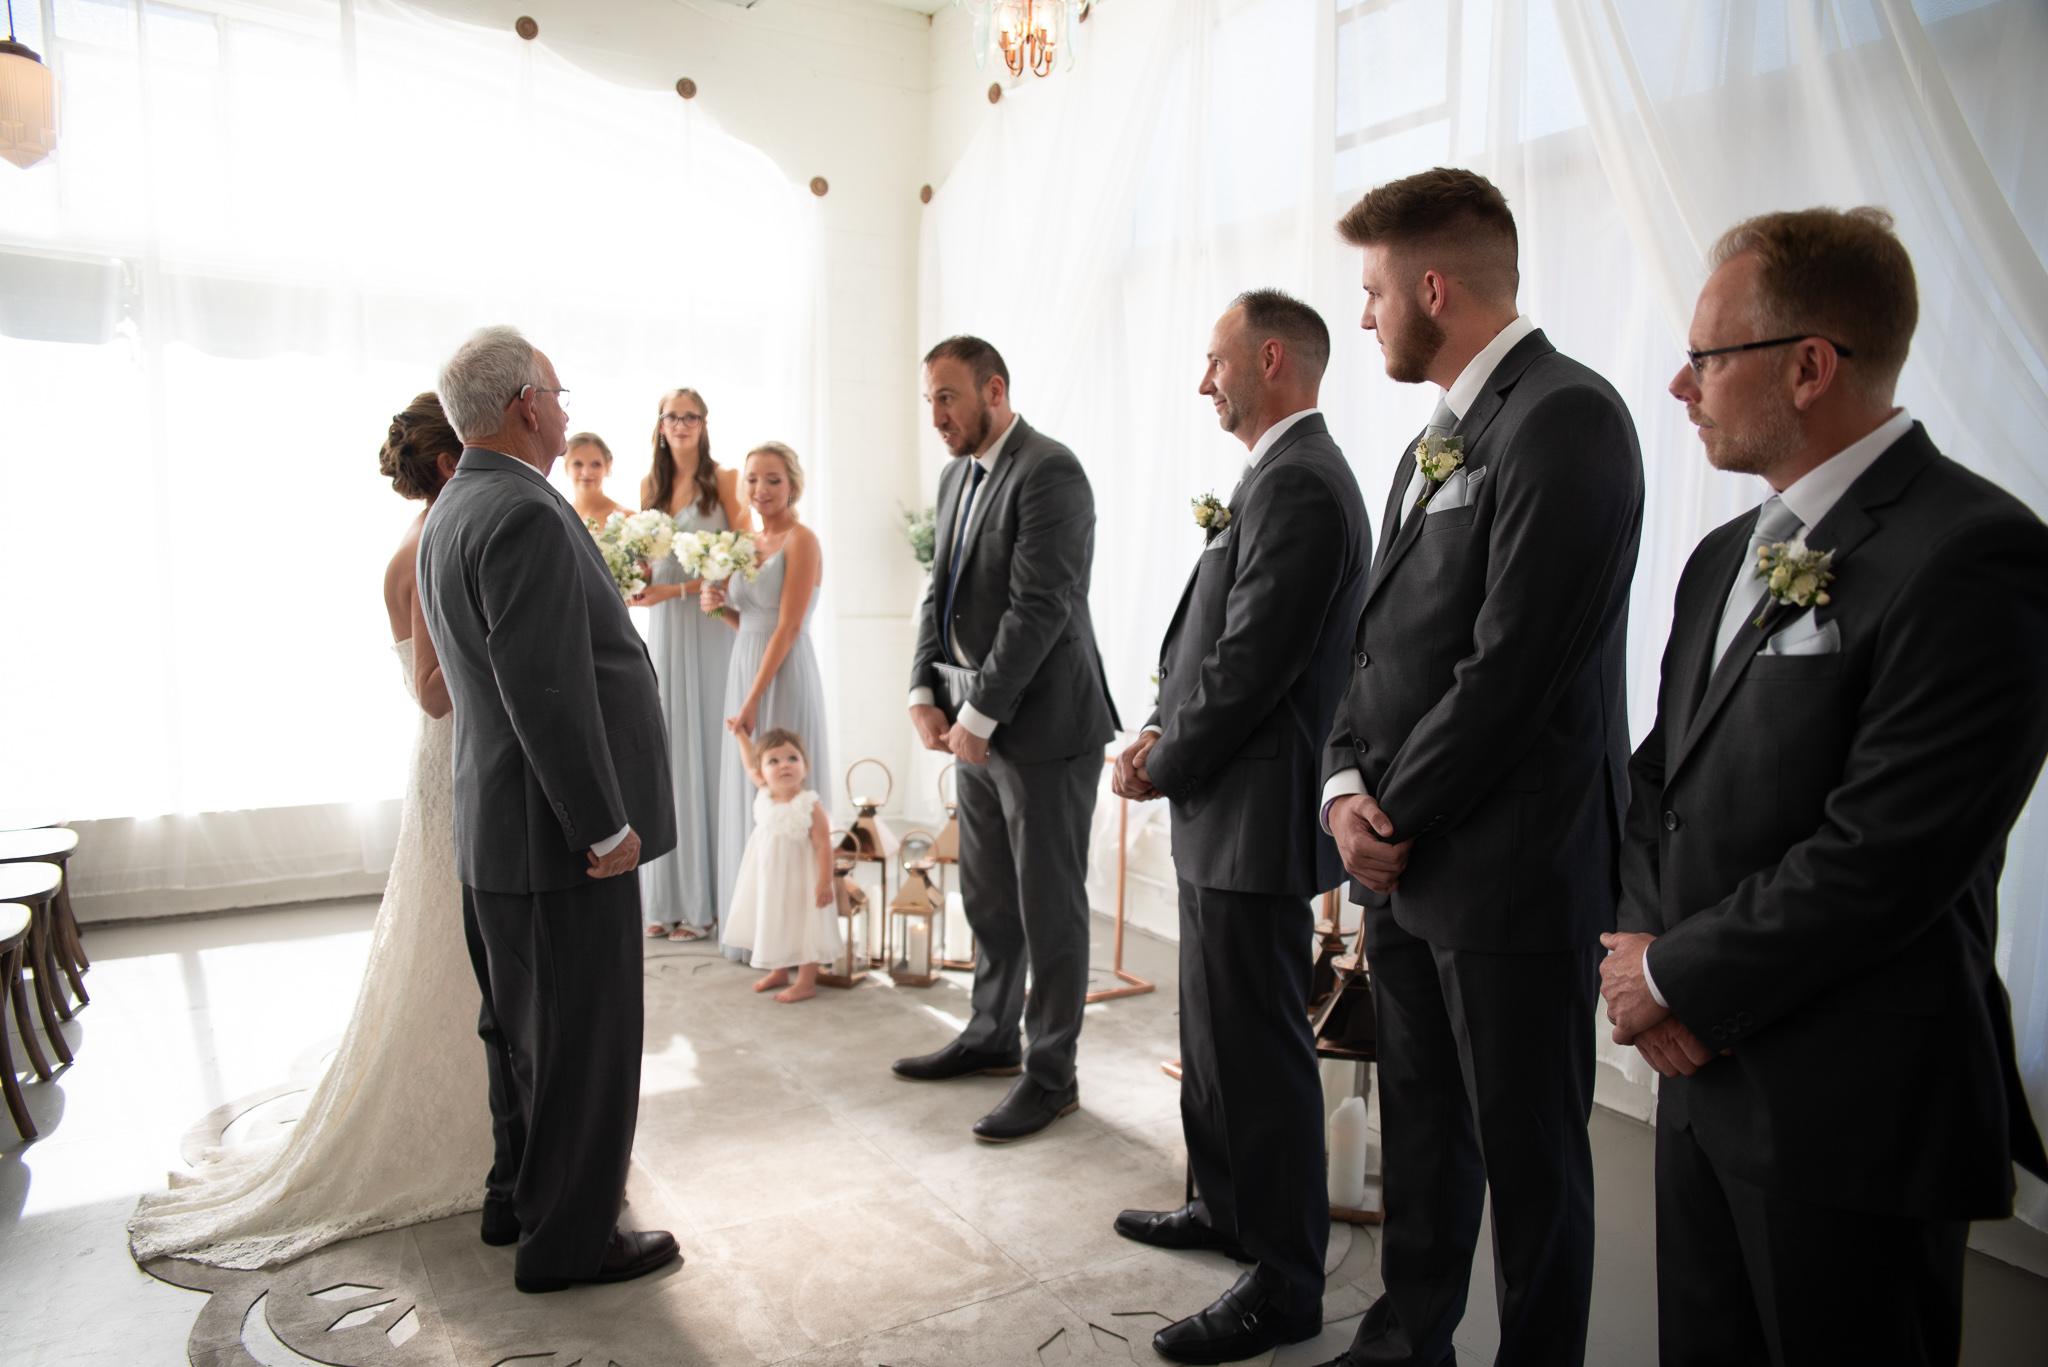 Real_Wedding_Small_Venue_Kansas_City_Chapel_on_the_Corner_DSC_5213-2.jpg